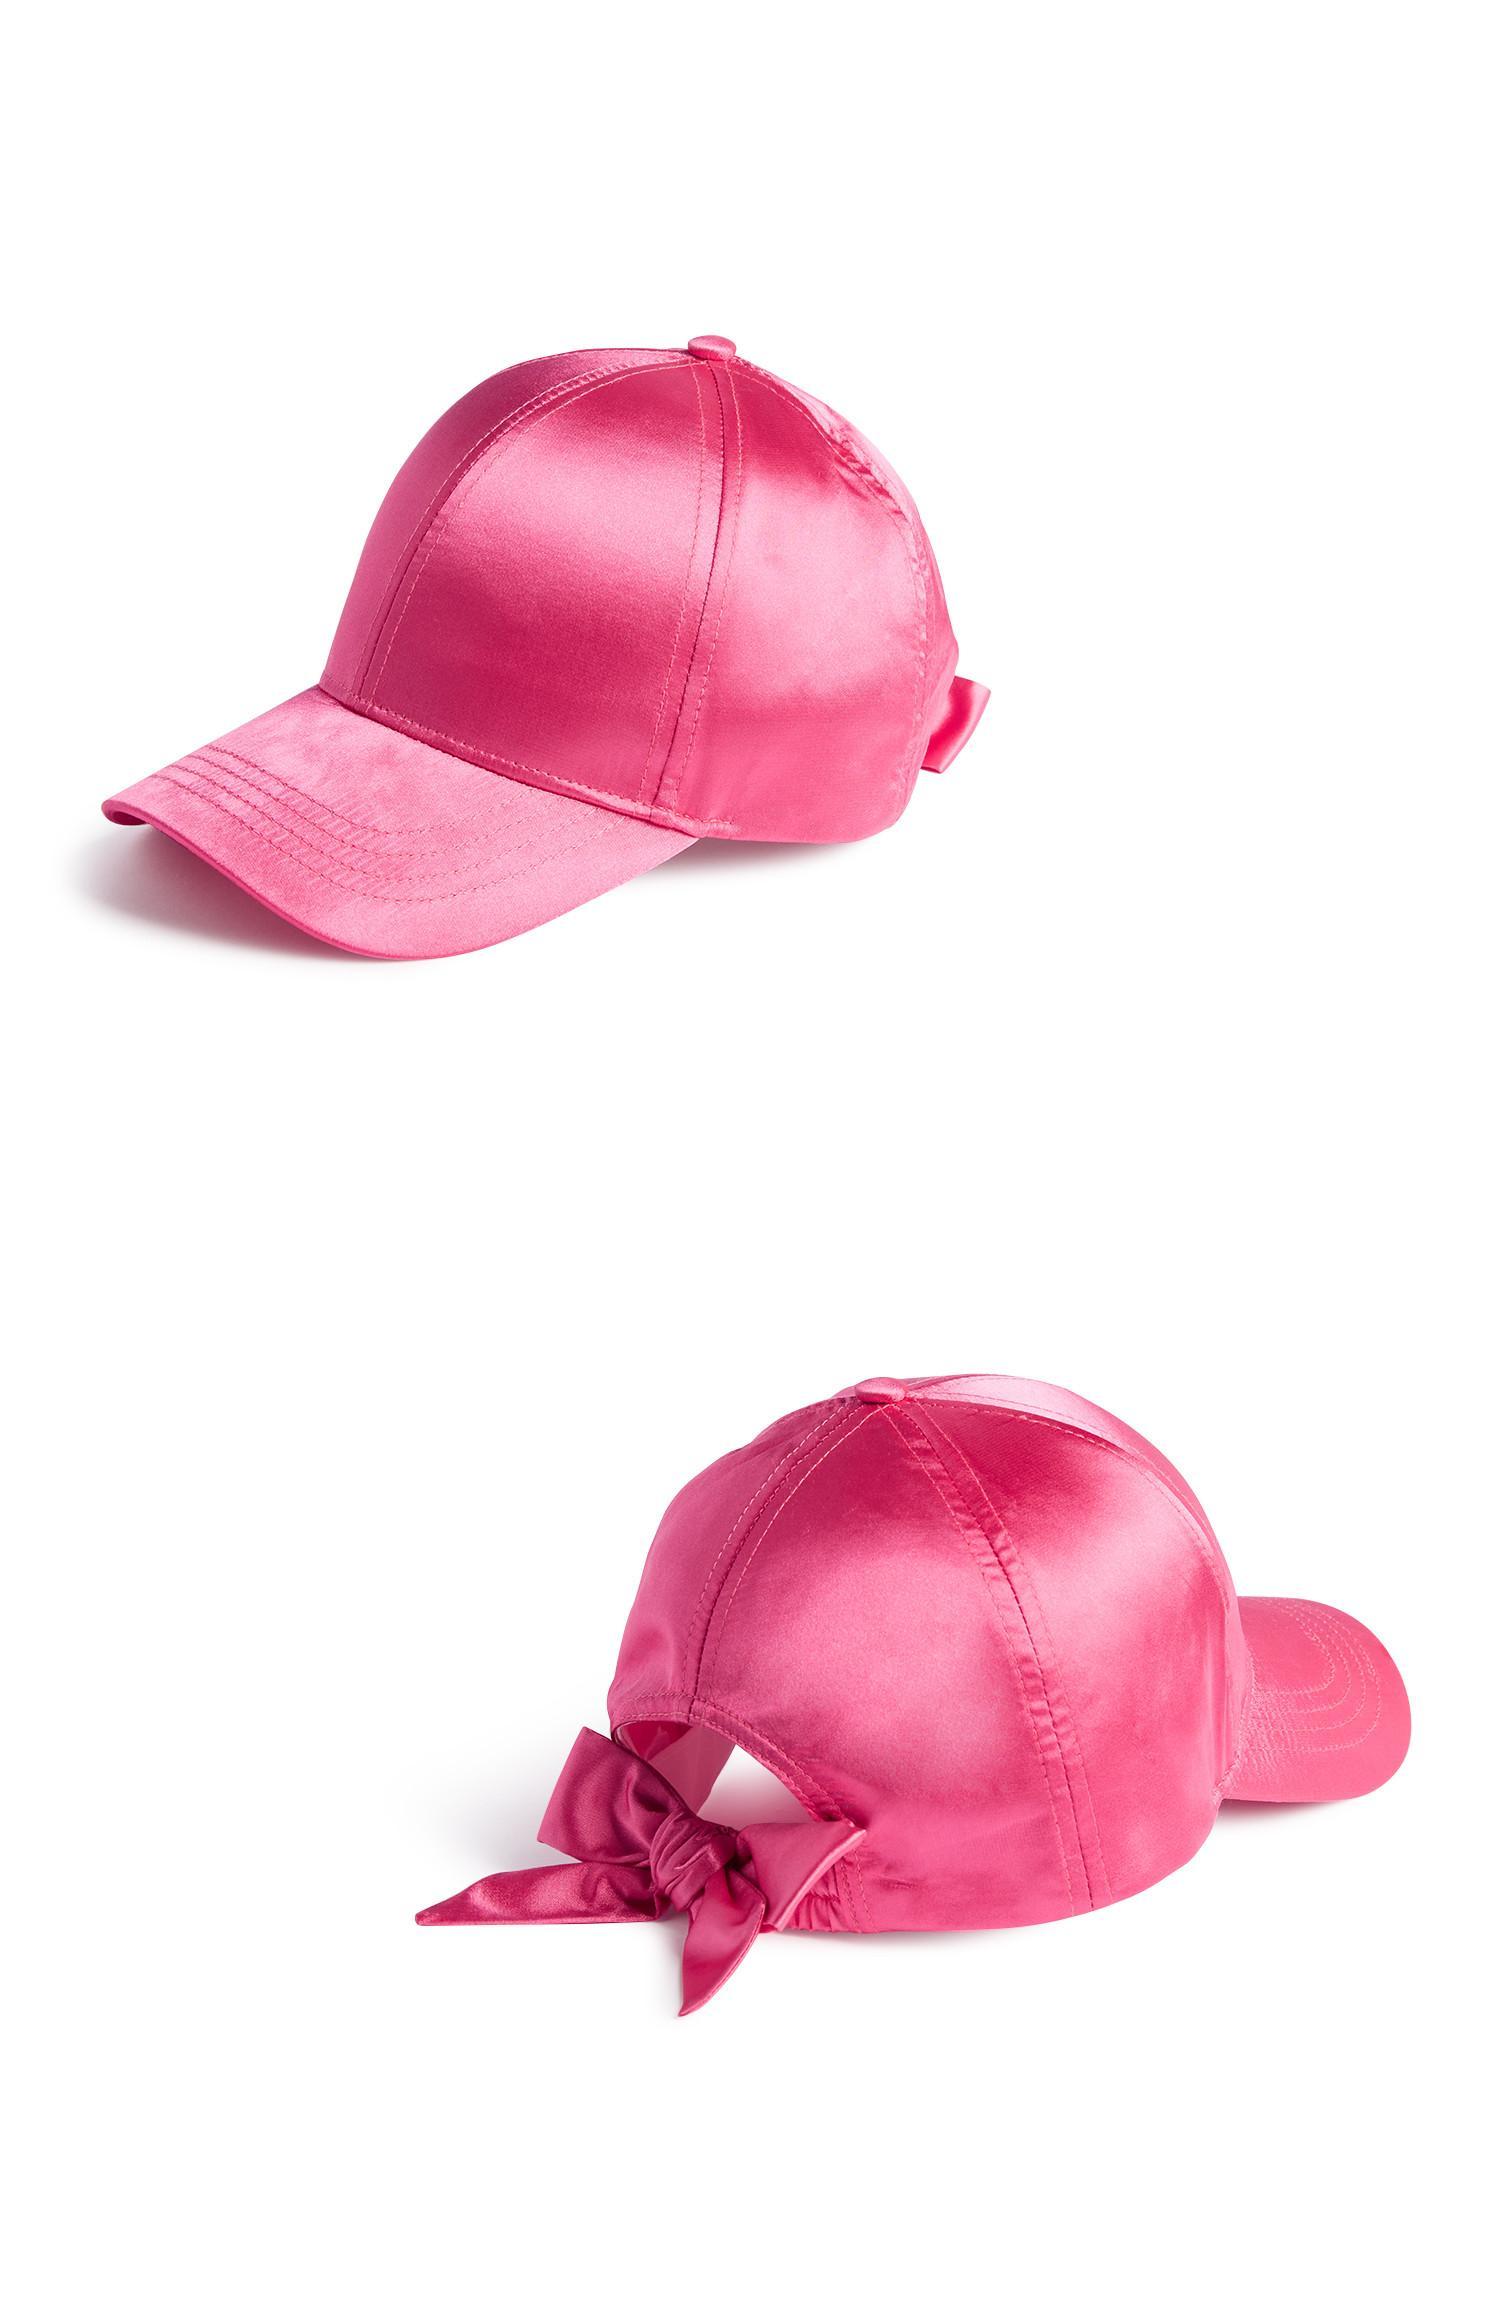 Pinke Satin-Cap mit Schleife